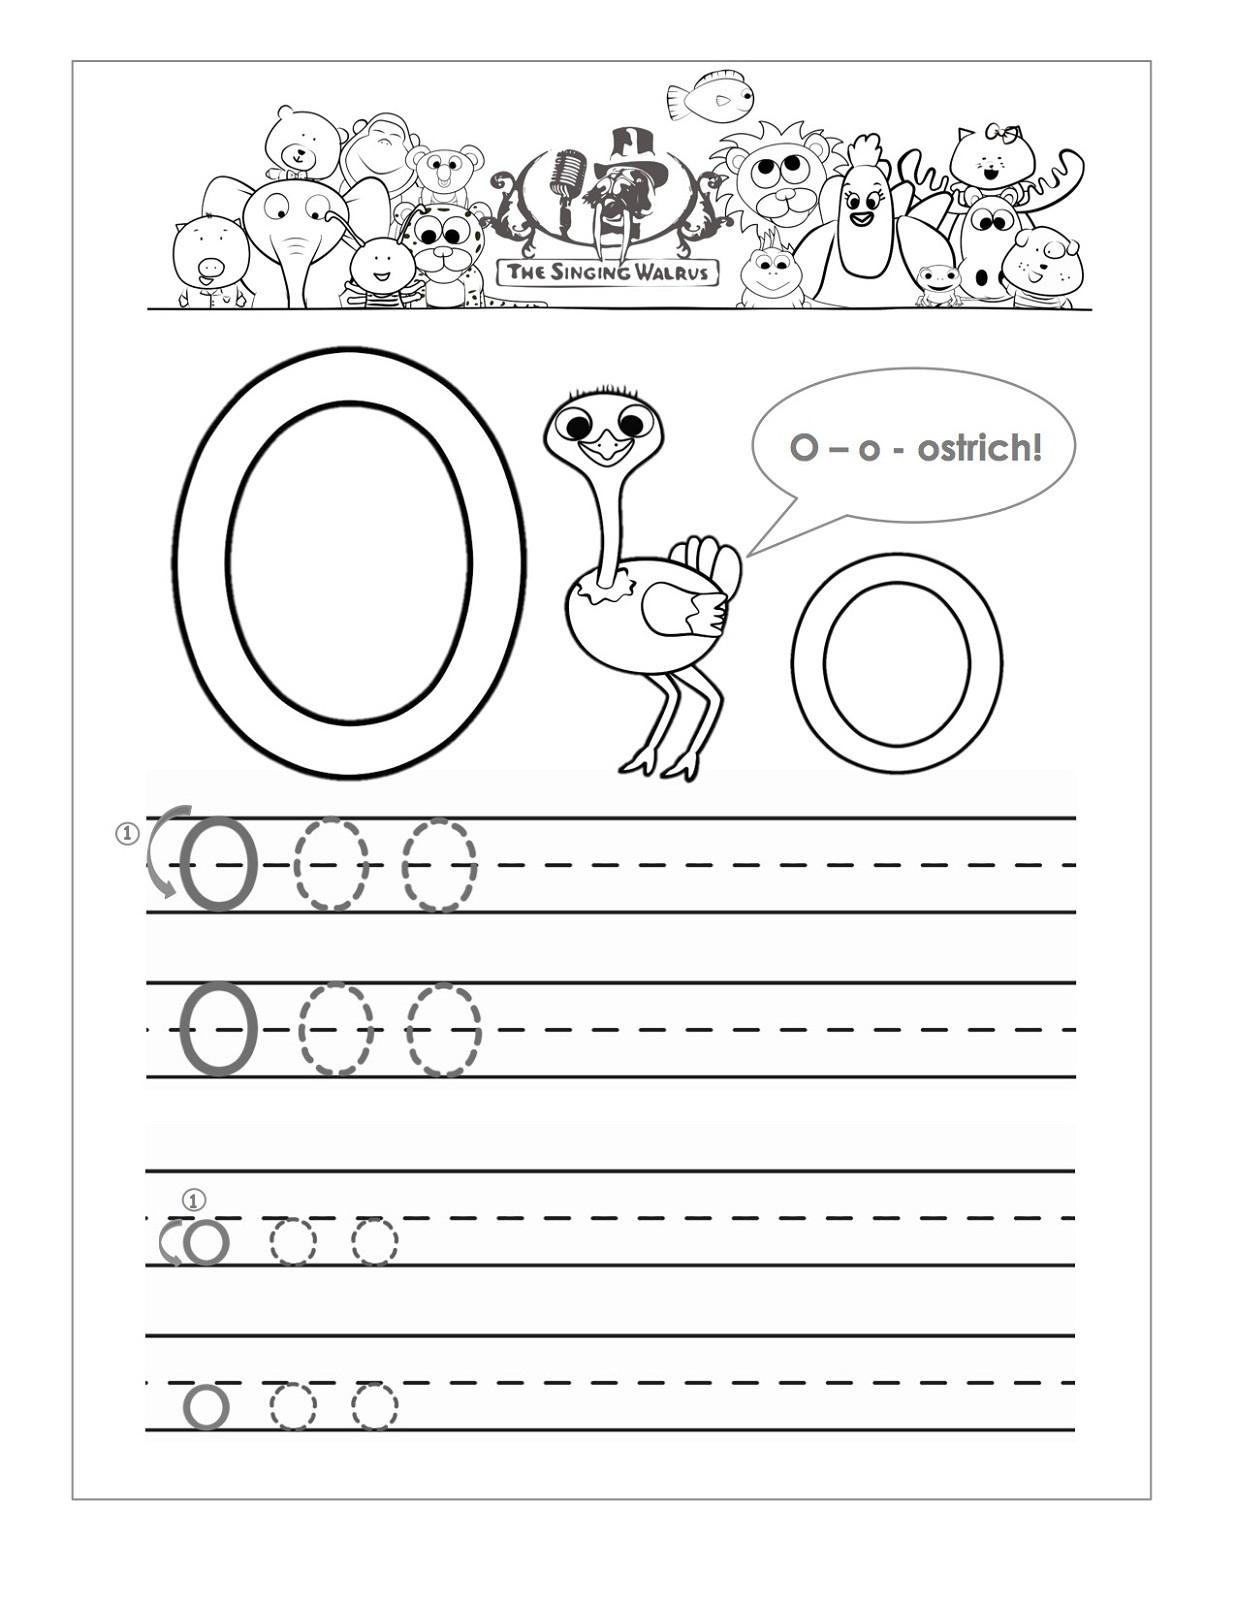 Letter O Worksheet for Kindergarten Letter O Worksheets for Preschool